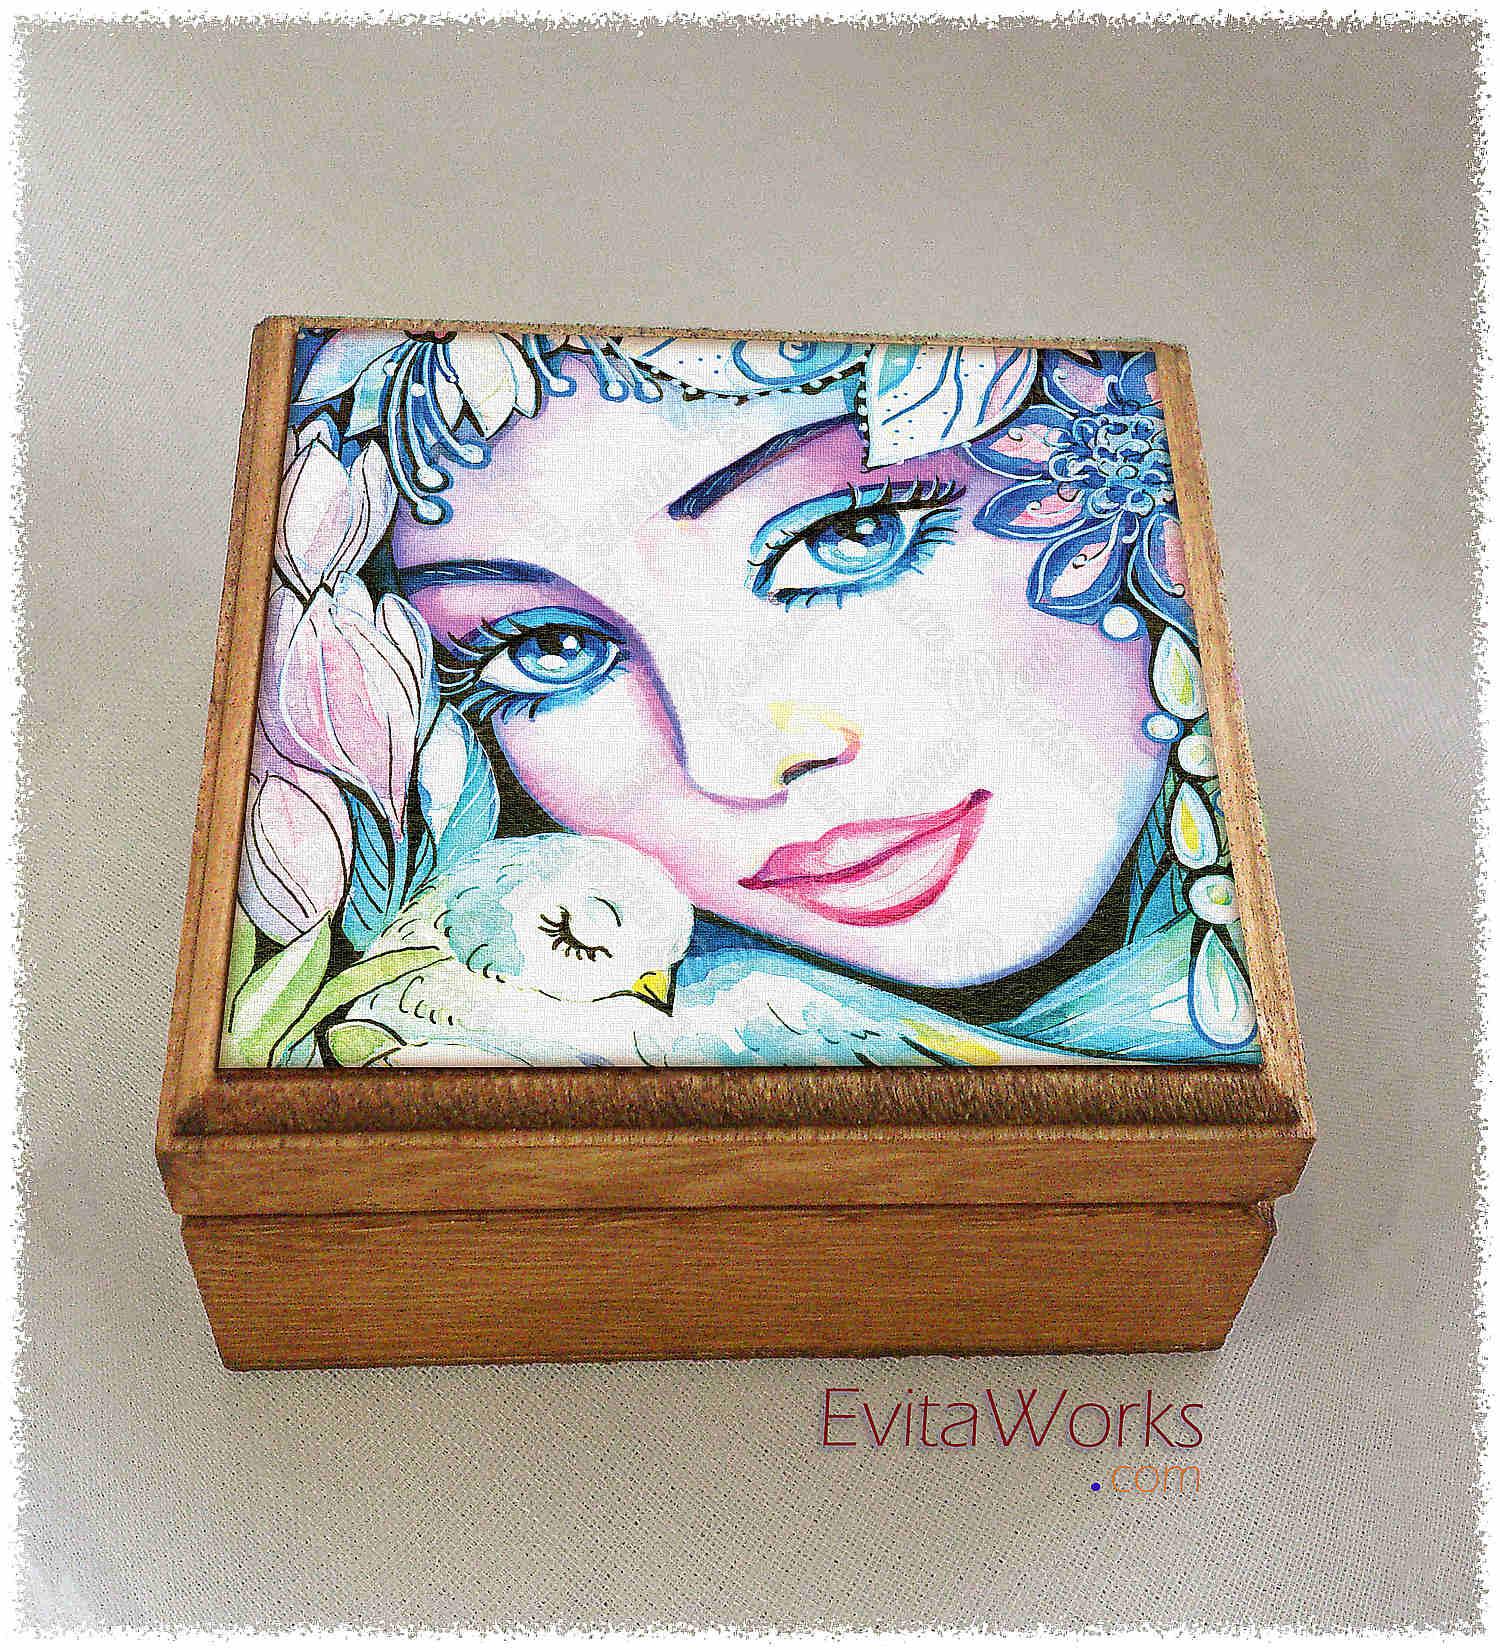 Exotic Visage 04 Boxsq ~ EvitaWorks